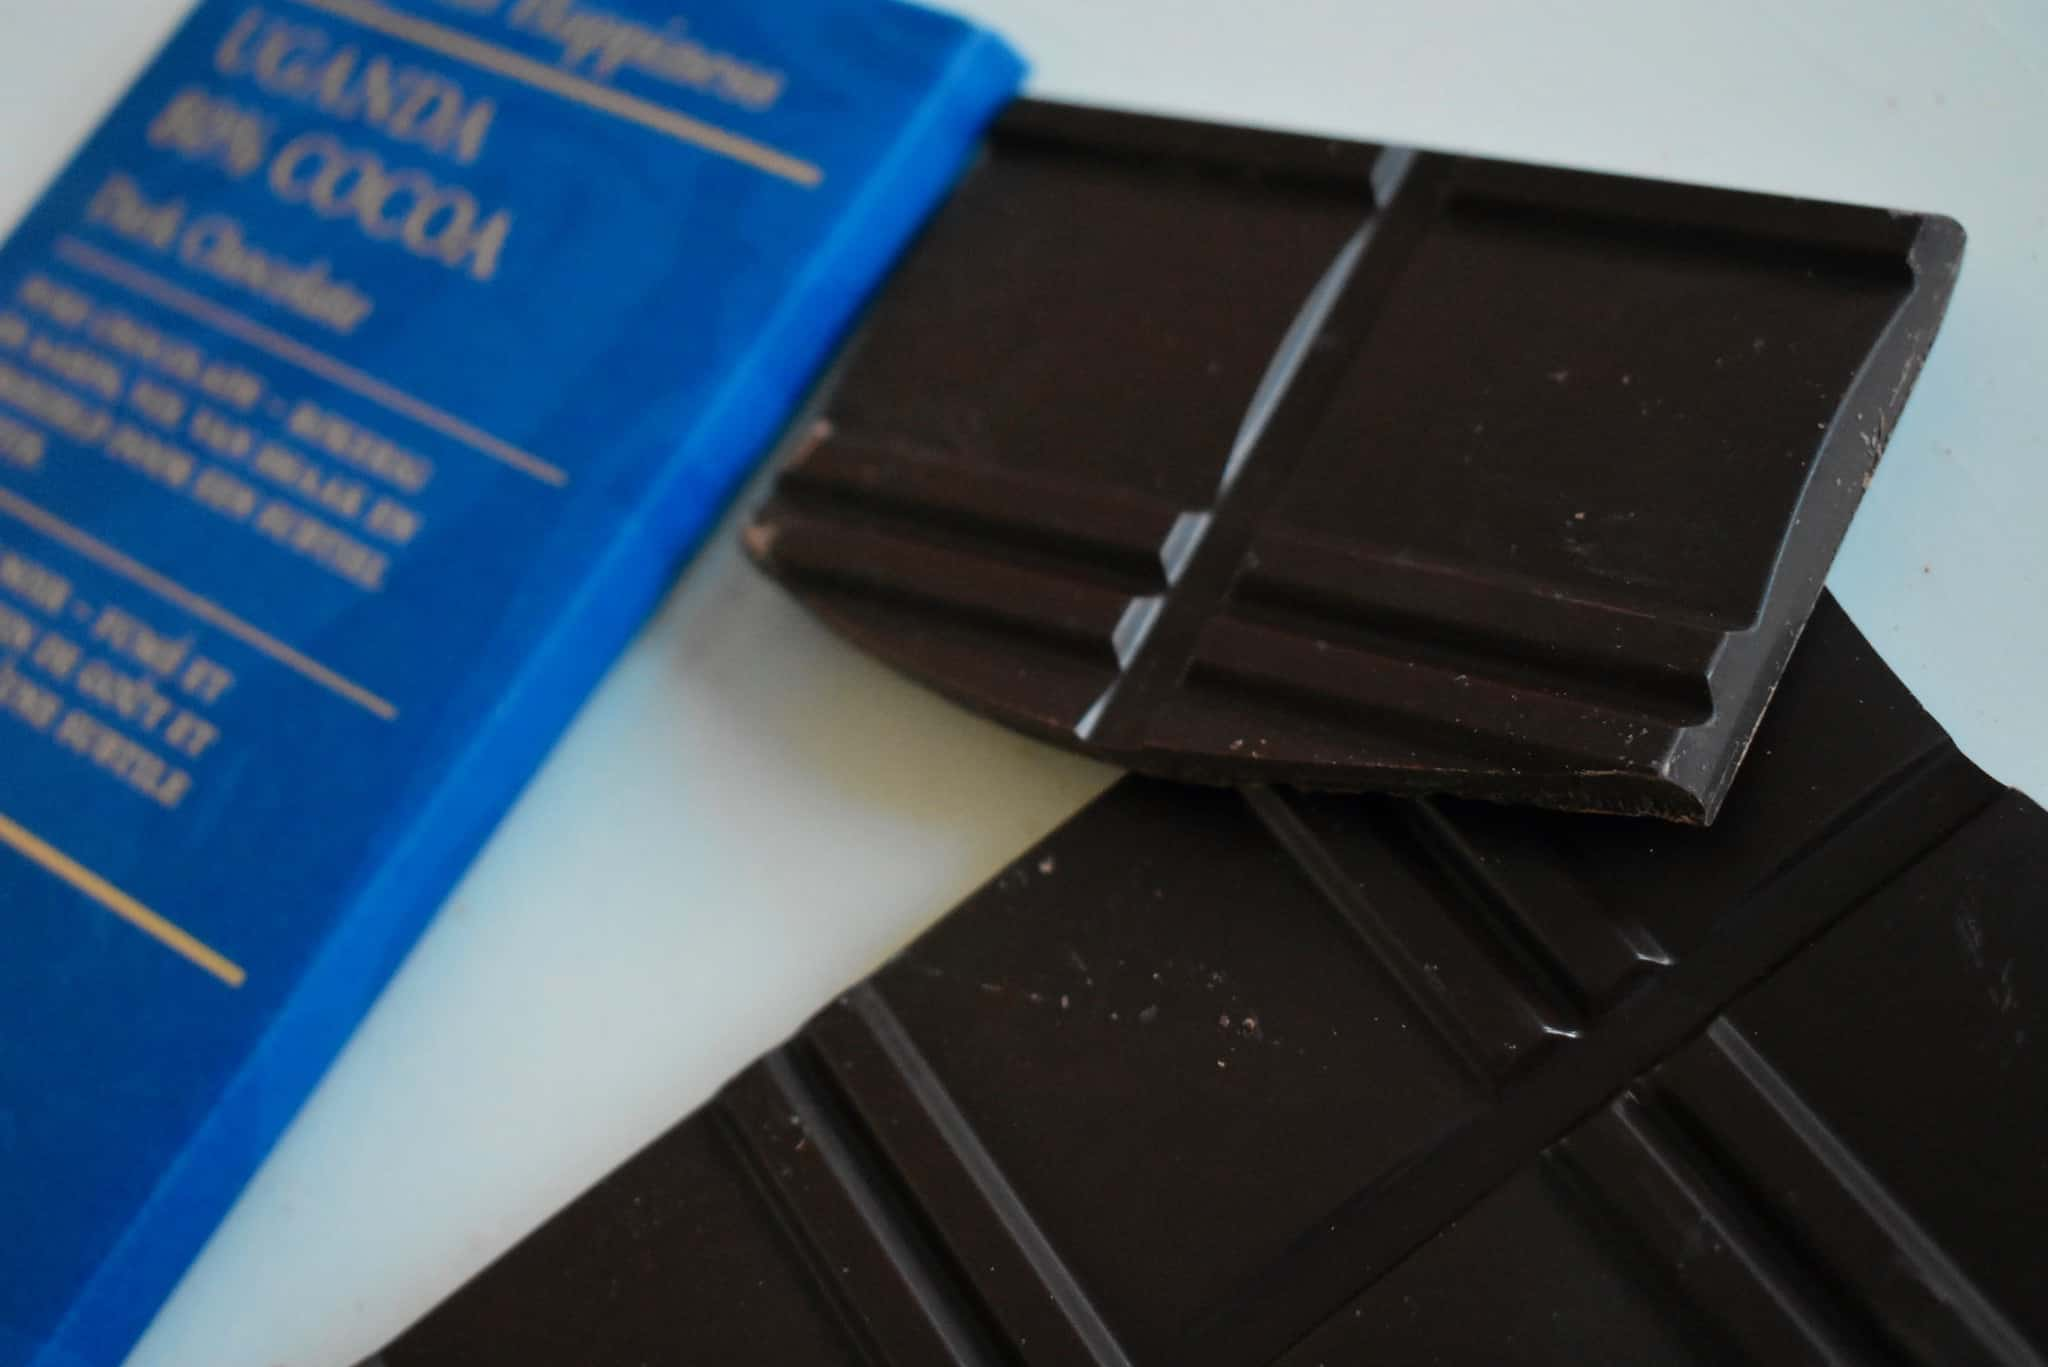 Delhaize Delicata Chocolade - Uganda 80% Cocoa